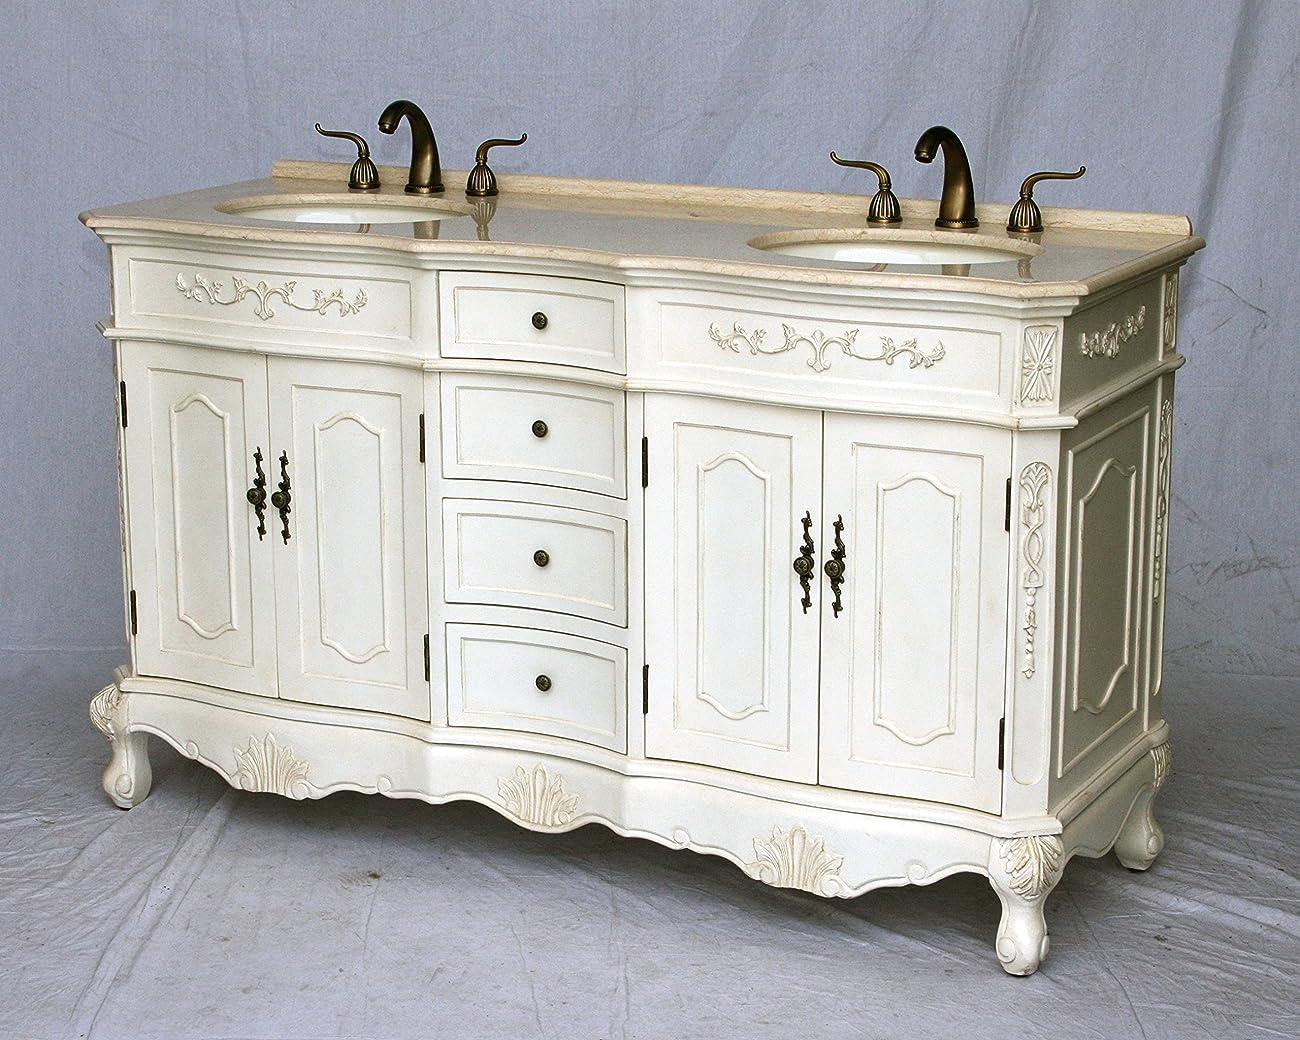 60-Inch Antique Style Double Sink Bathroom Vanity Model 1905-60 261BE 0